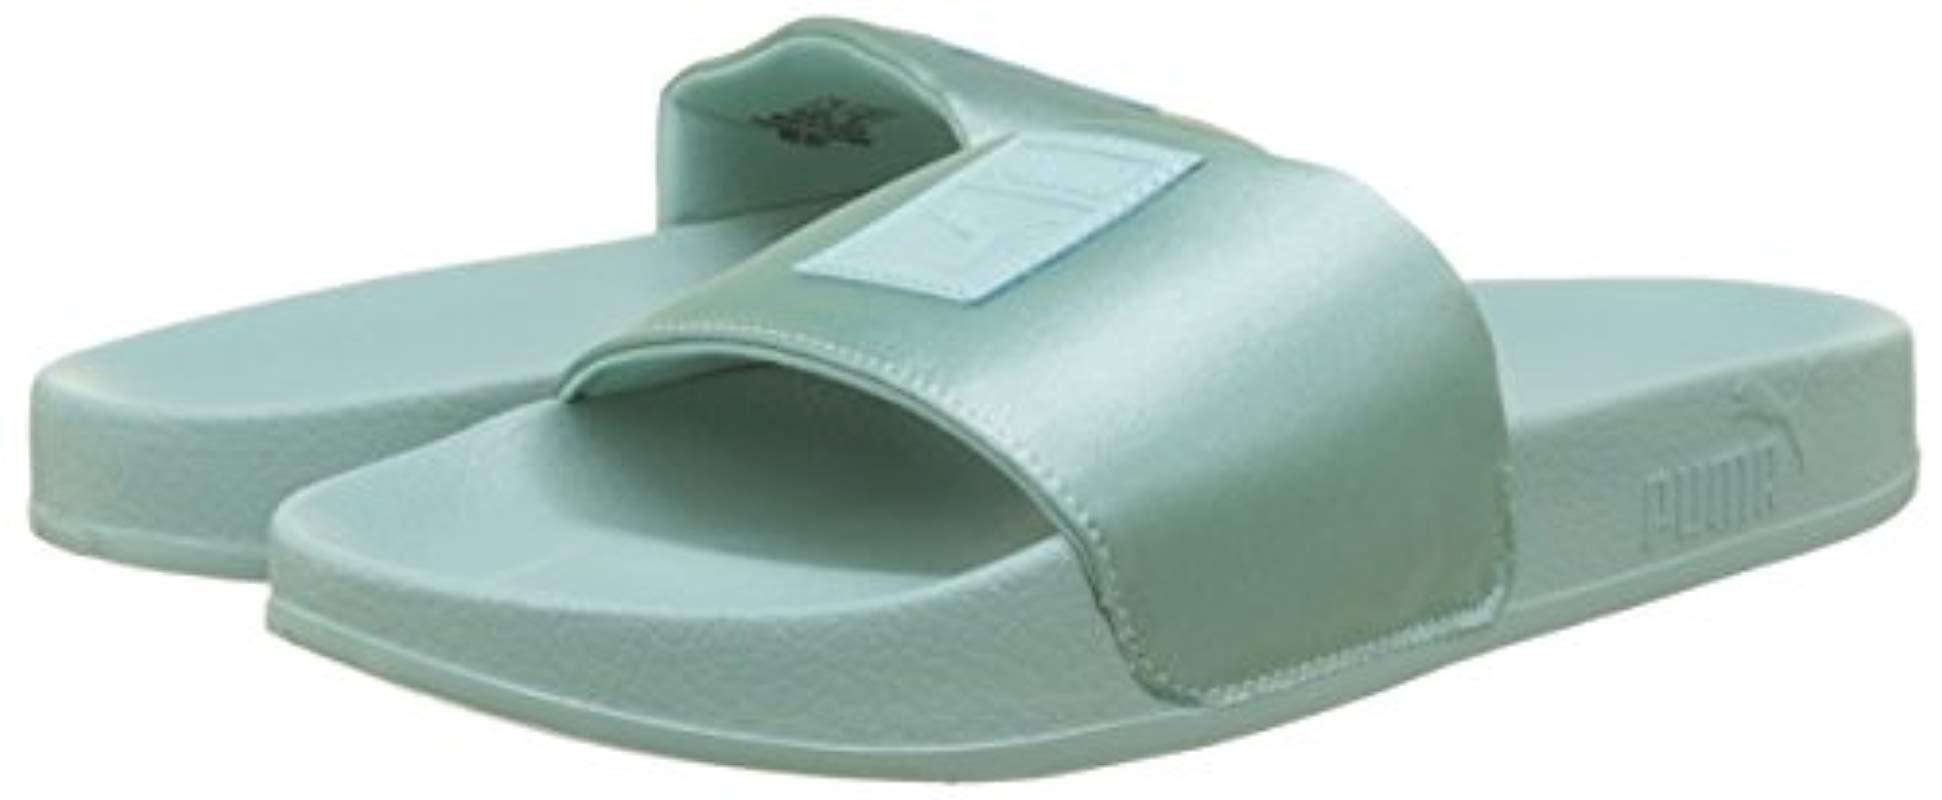 chaussure plage femme puma